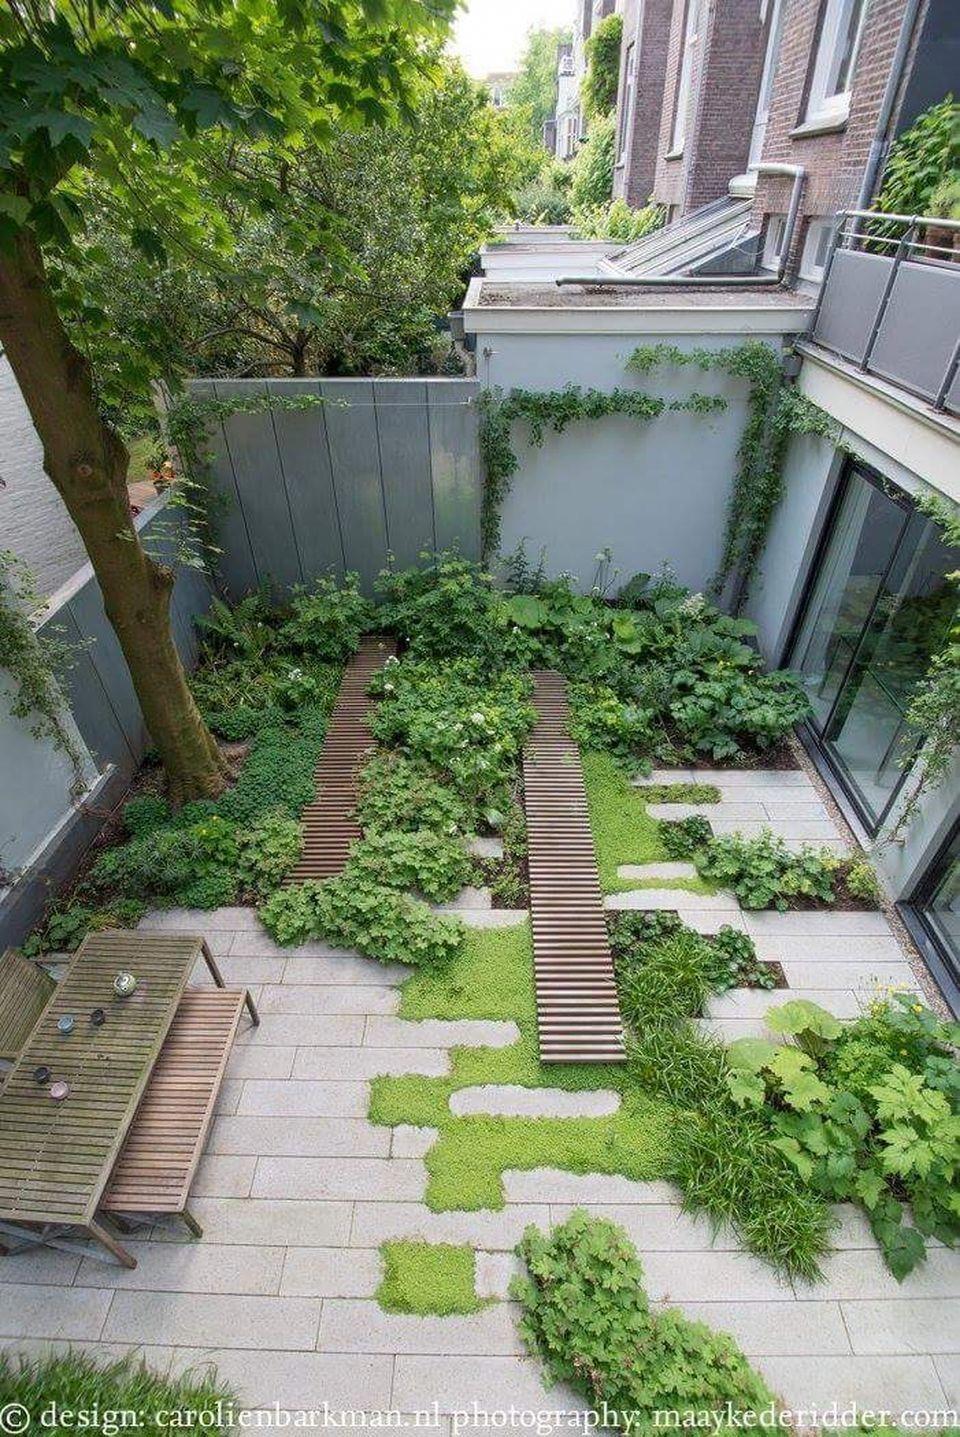 Image Result For Small Garden Amsterdam Small Garden Landscape Small Courtyard Gardens Small Garden Landscape Design